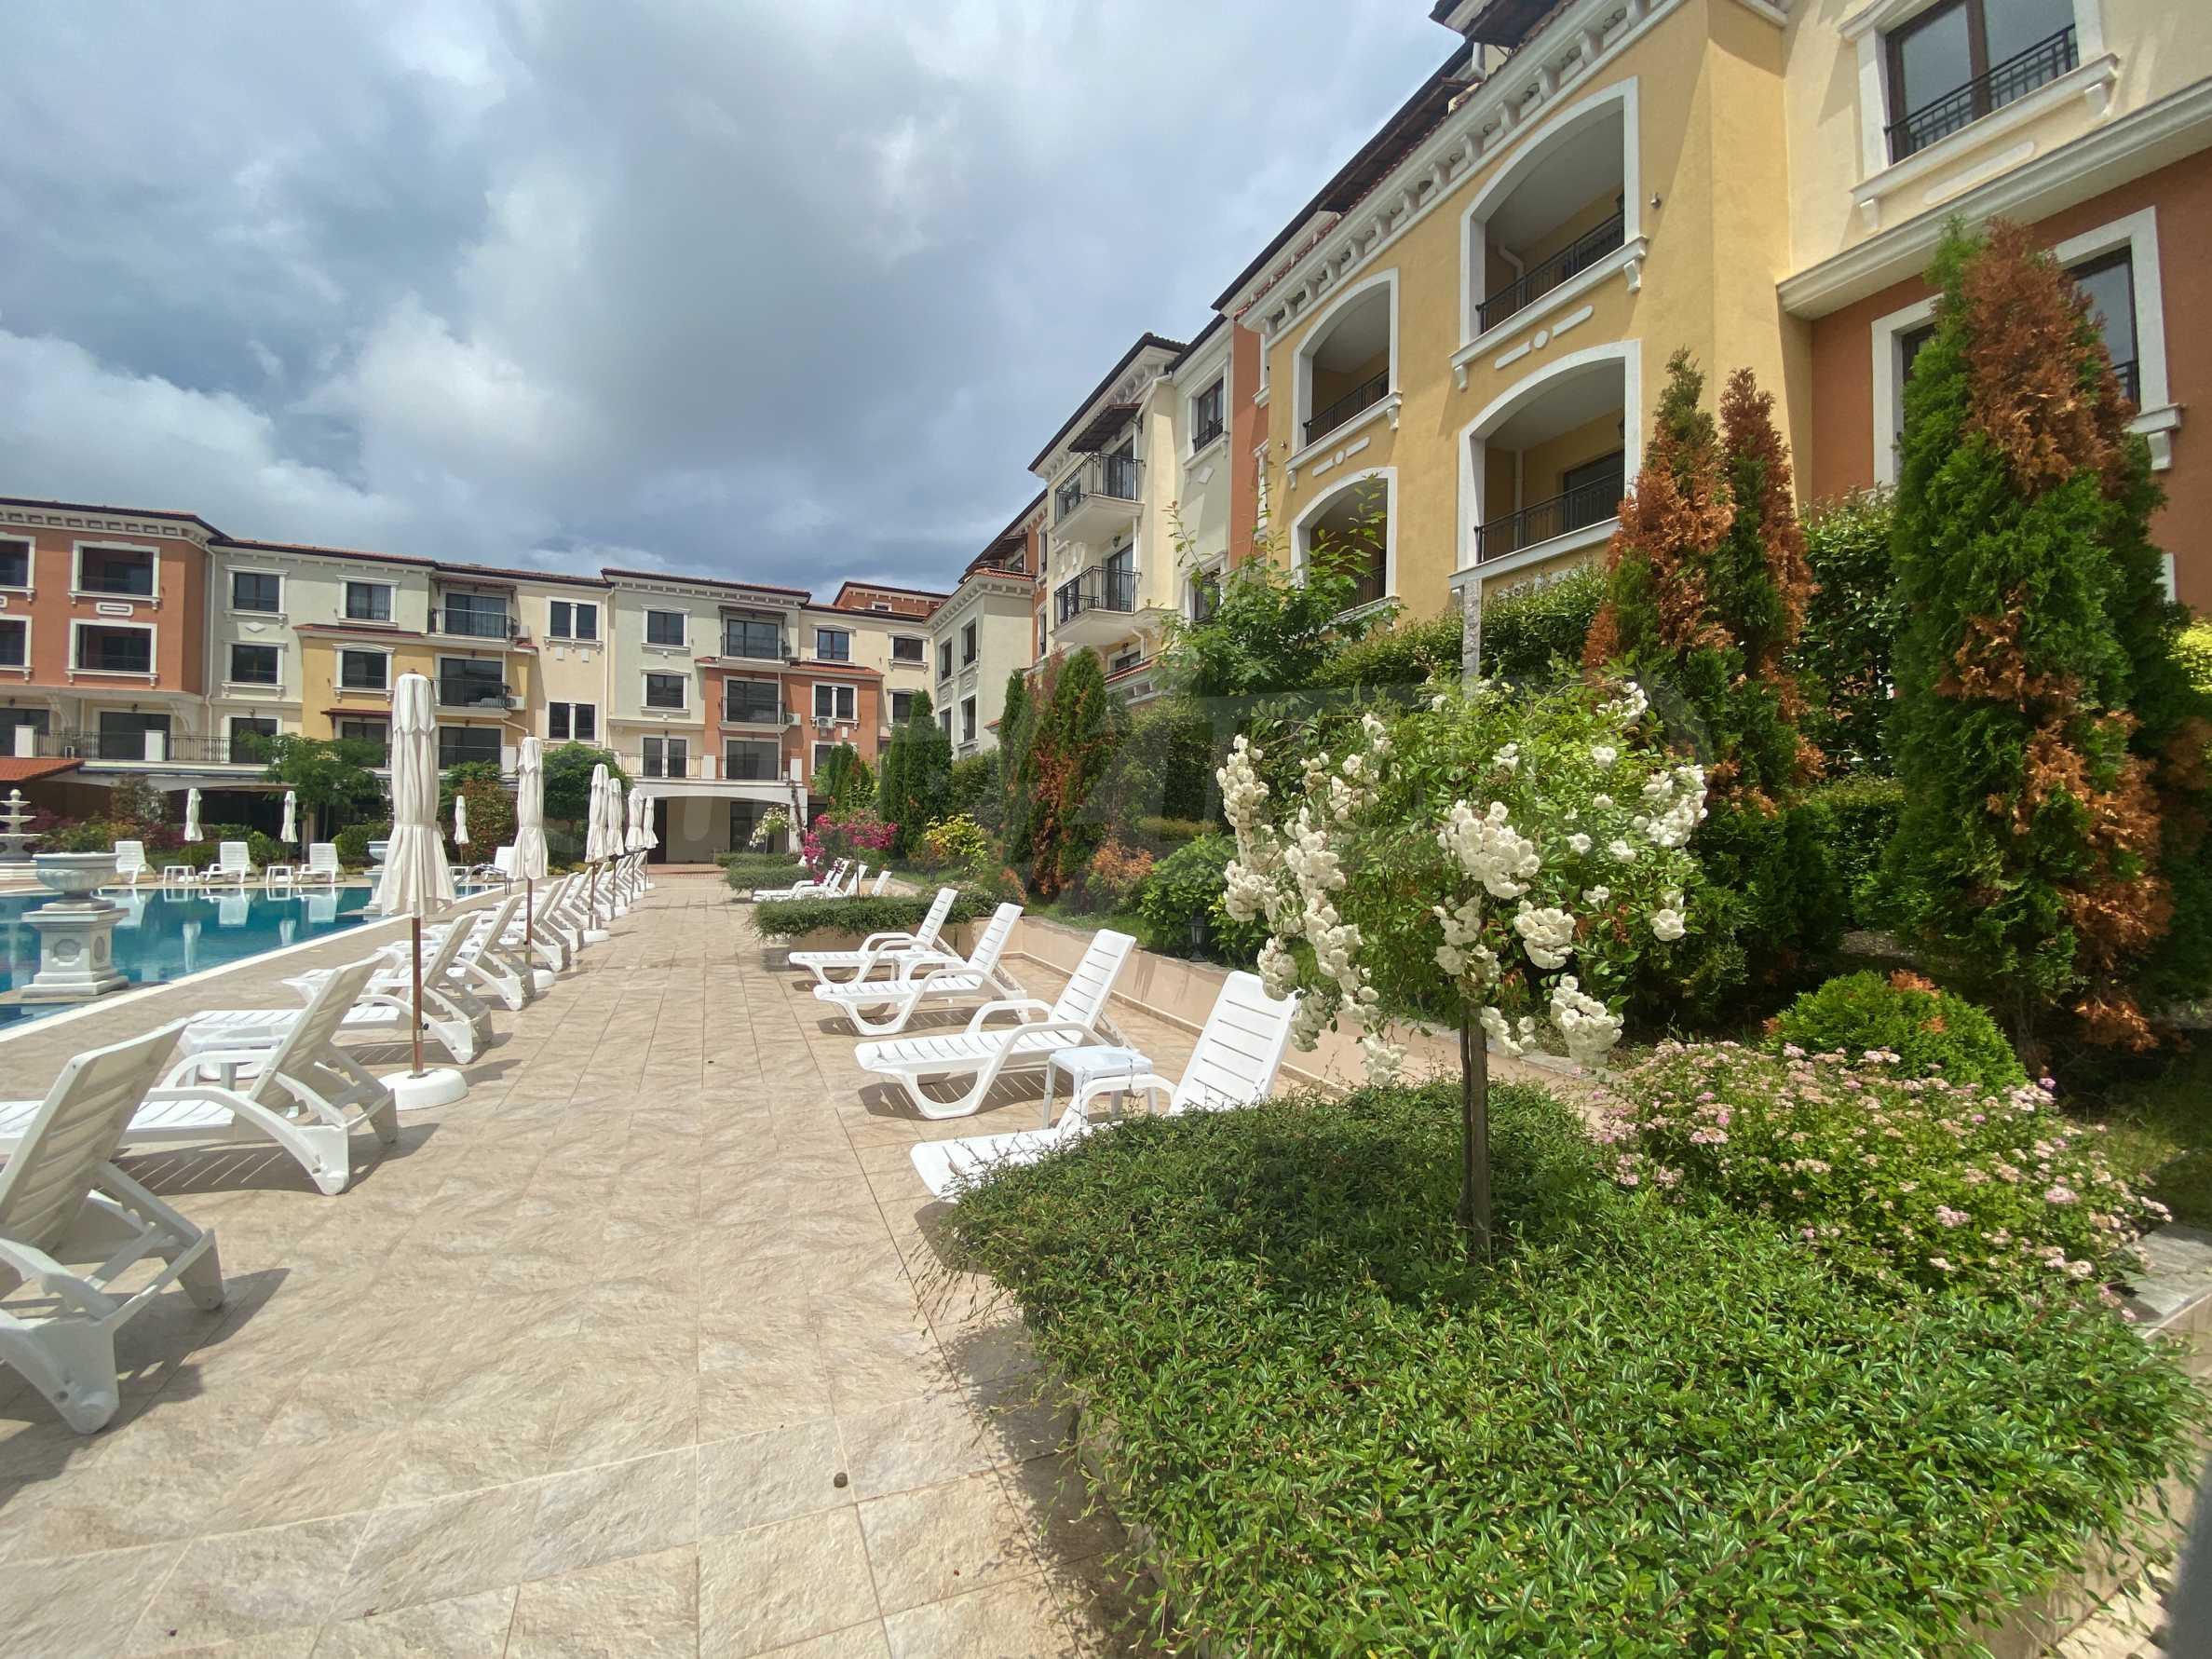 Lily Beach - splendid, built in Italian style complex near Kavatsi beach (Sozopol) 15